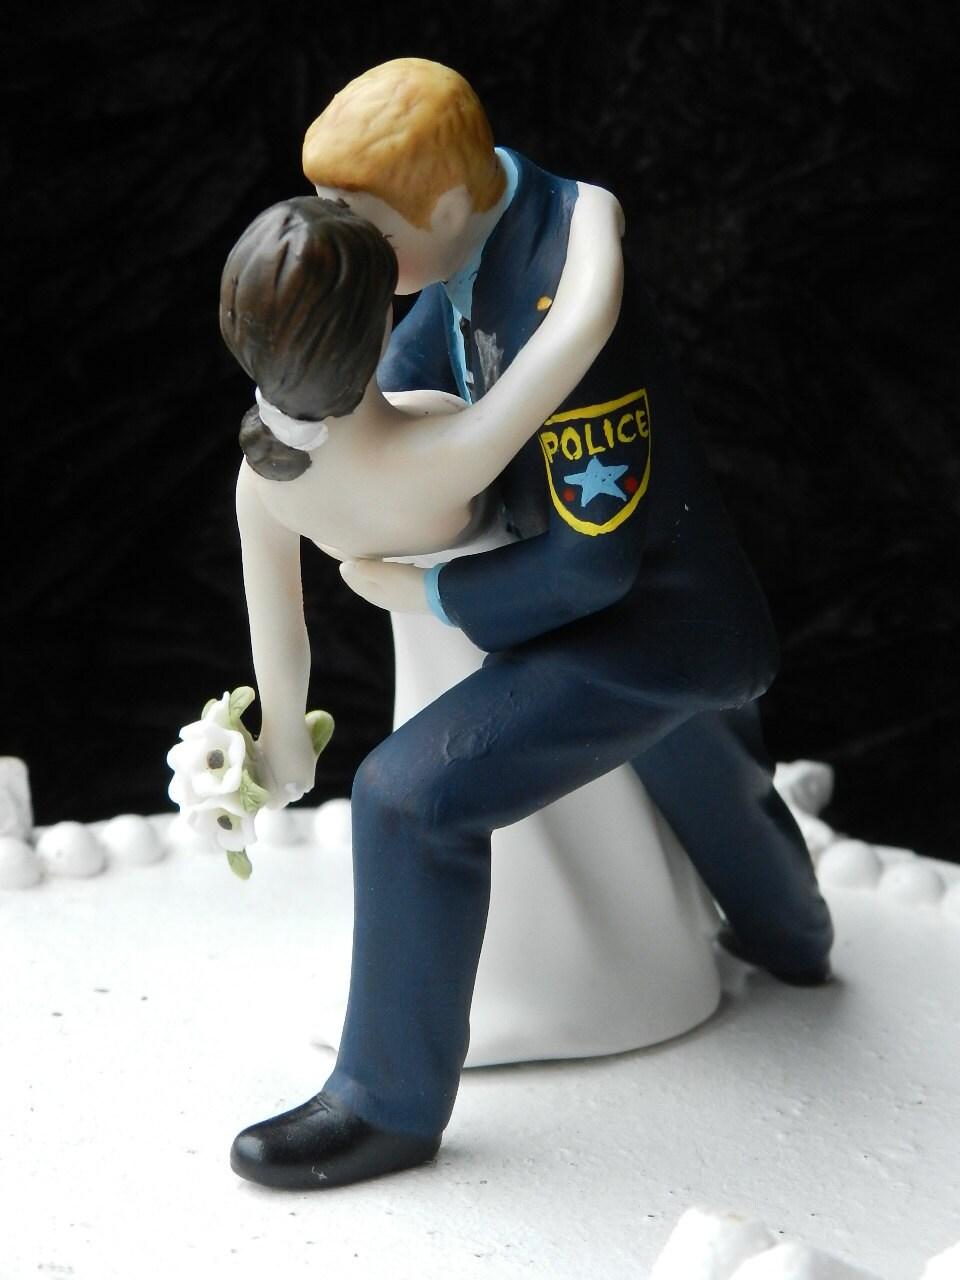 Police band for wedding